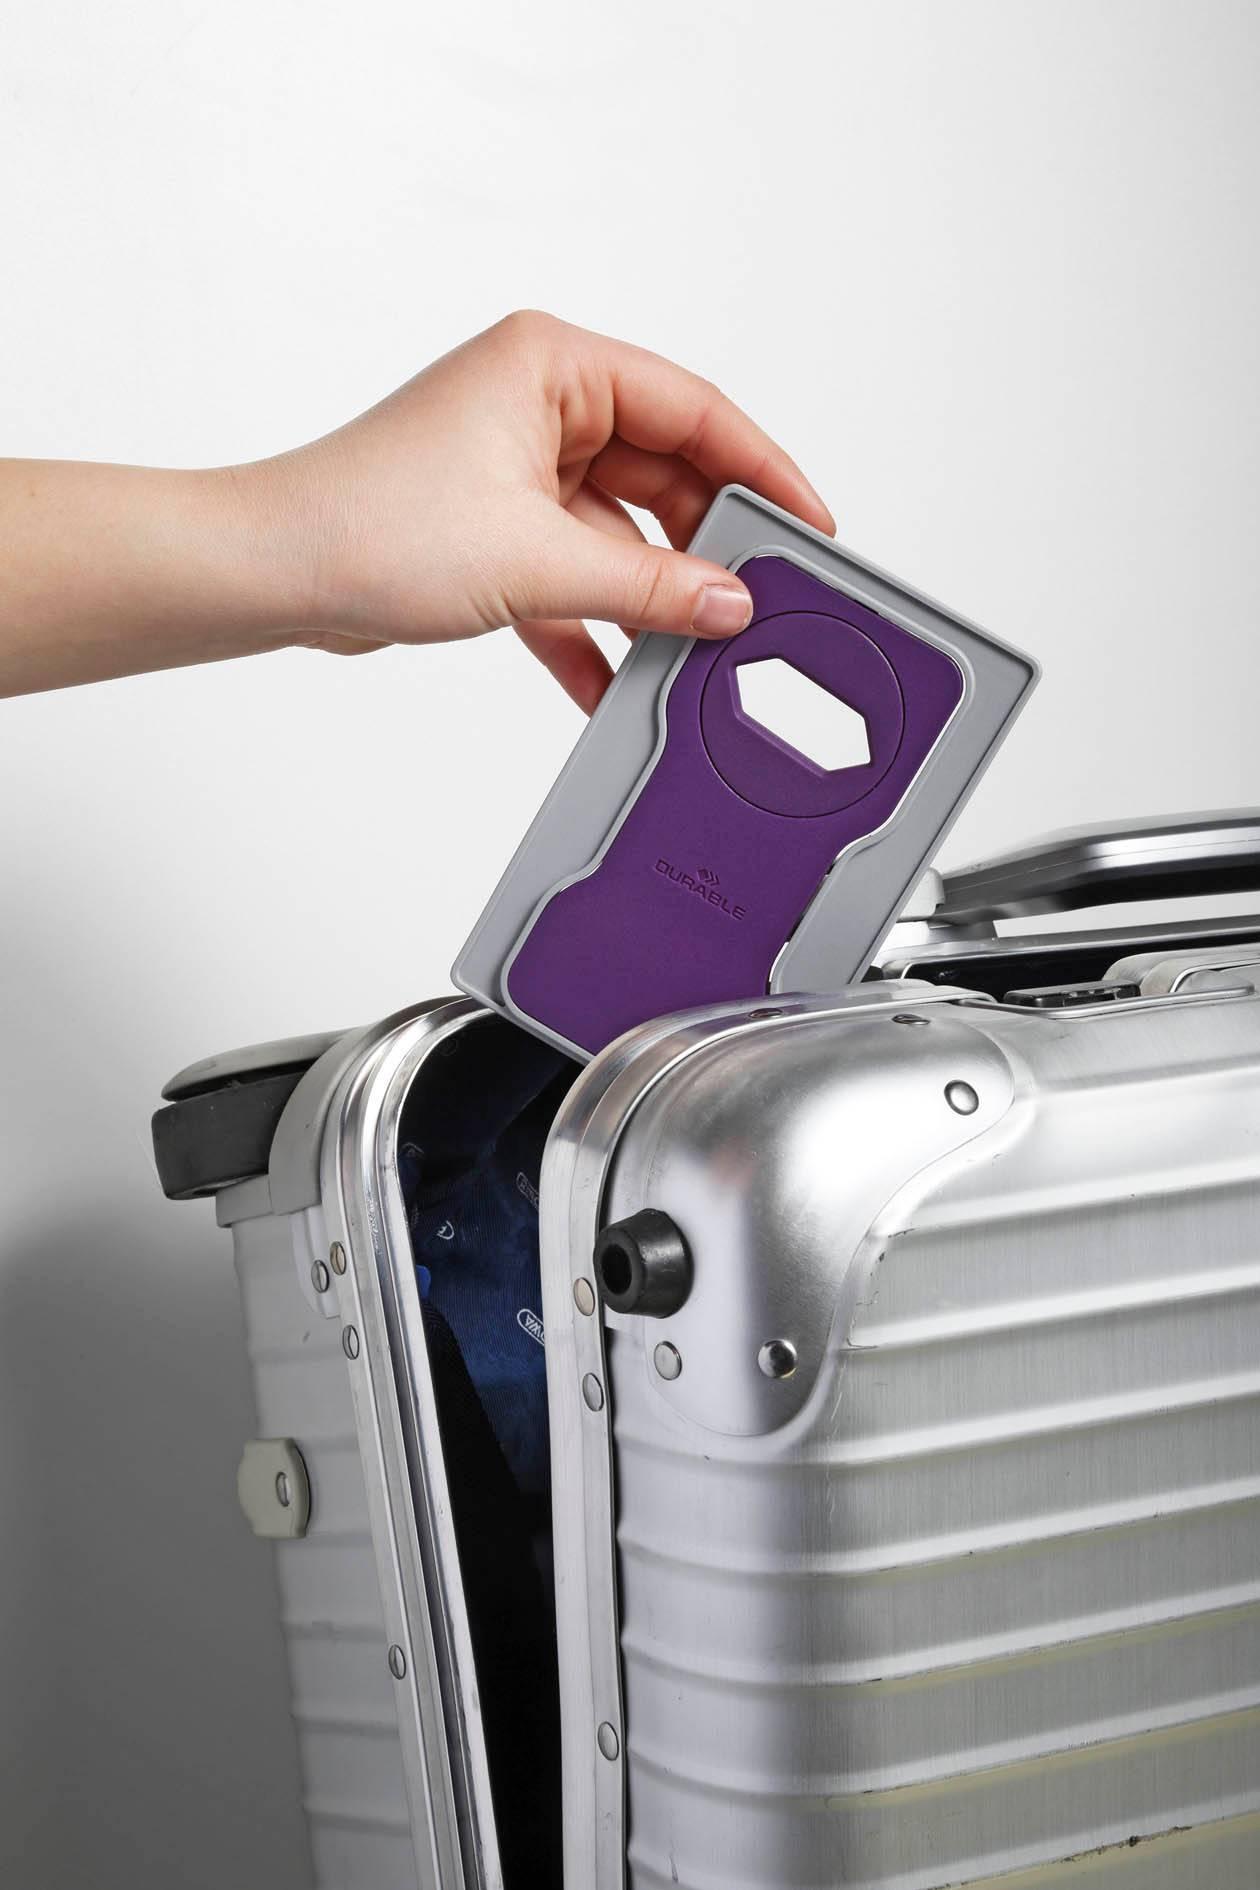 Подставка Durable 7735-12 Varicolor фиолетовый/серый - фото 4